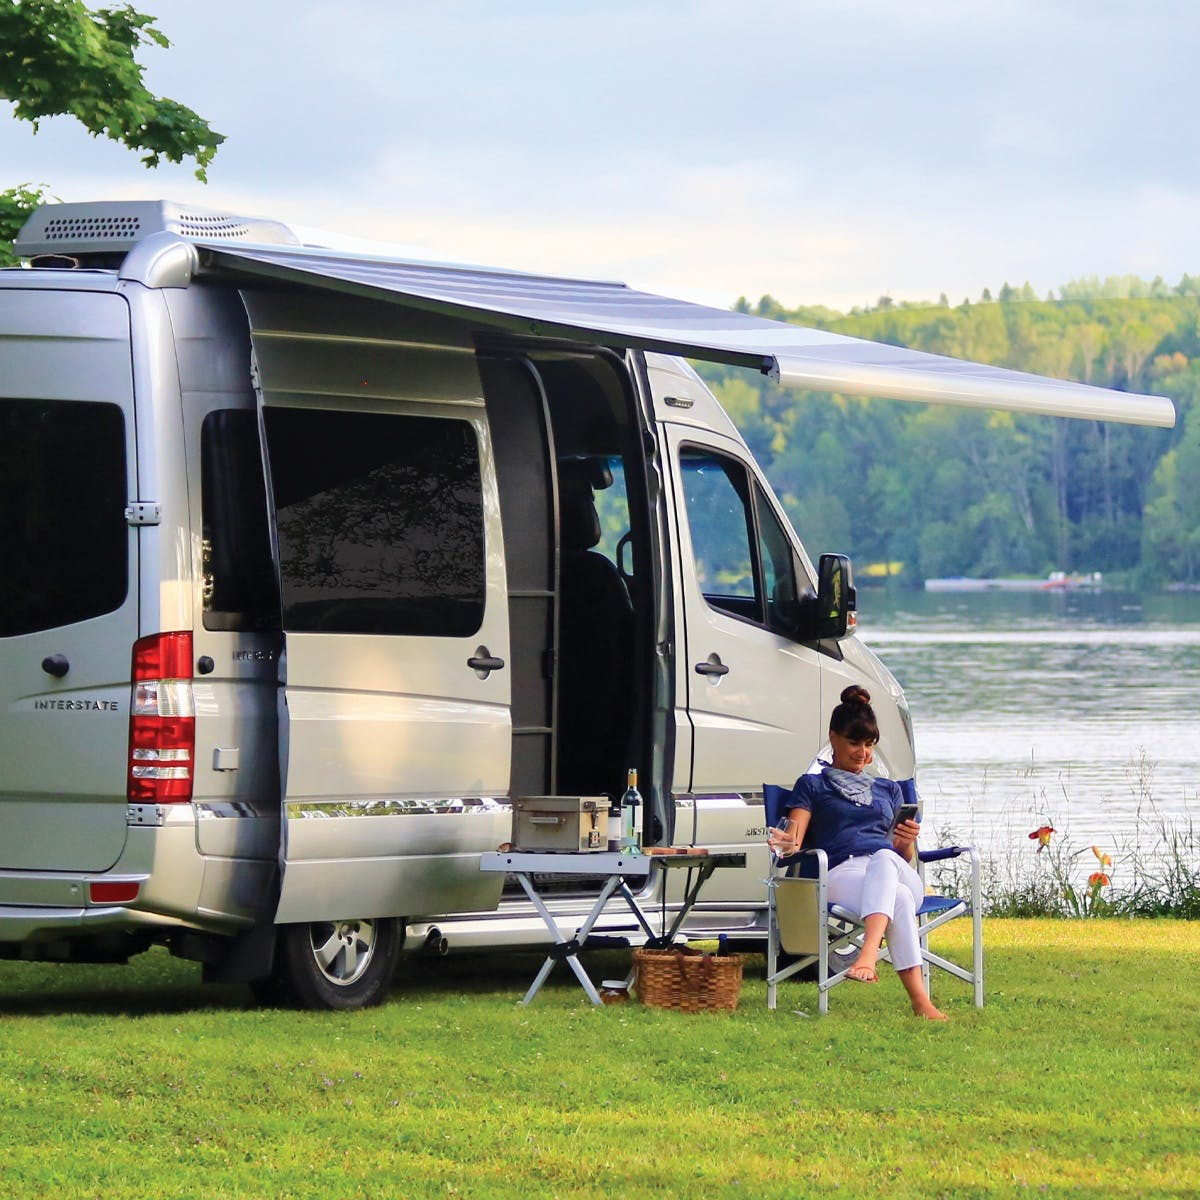 Airstream Interstate Nineteen Mercedes Benz grass water trees explore travel woman